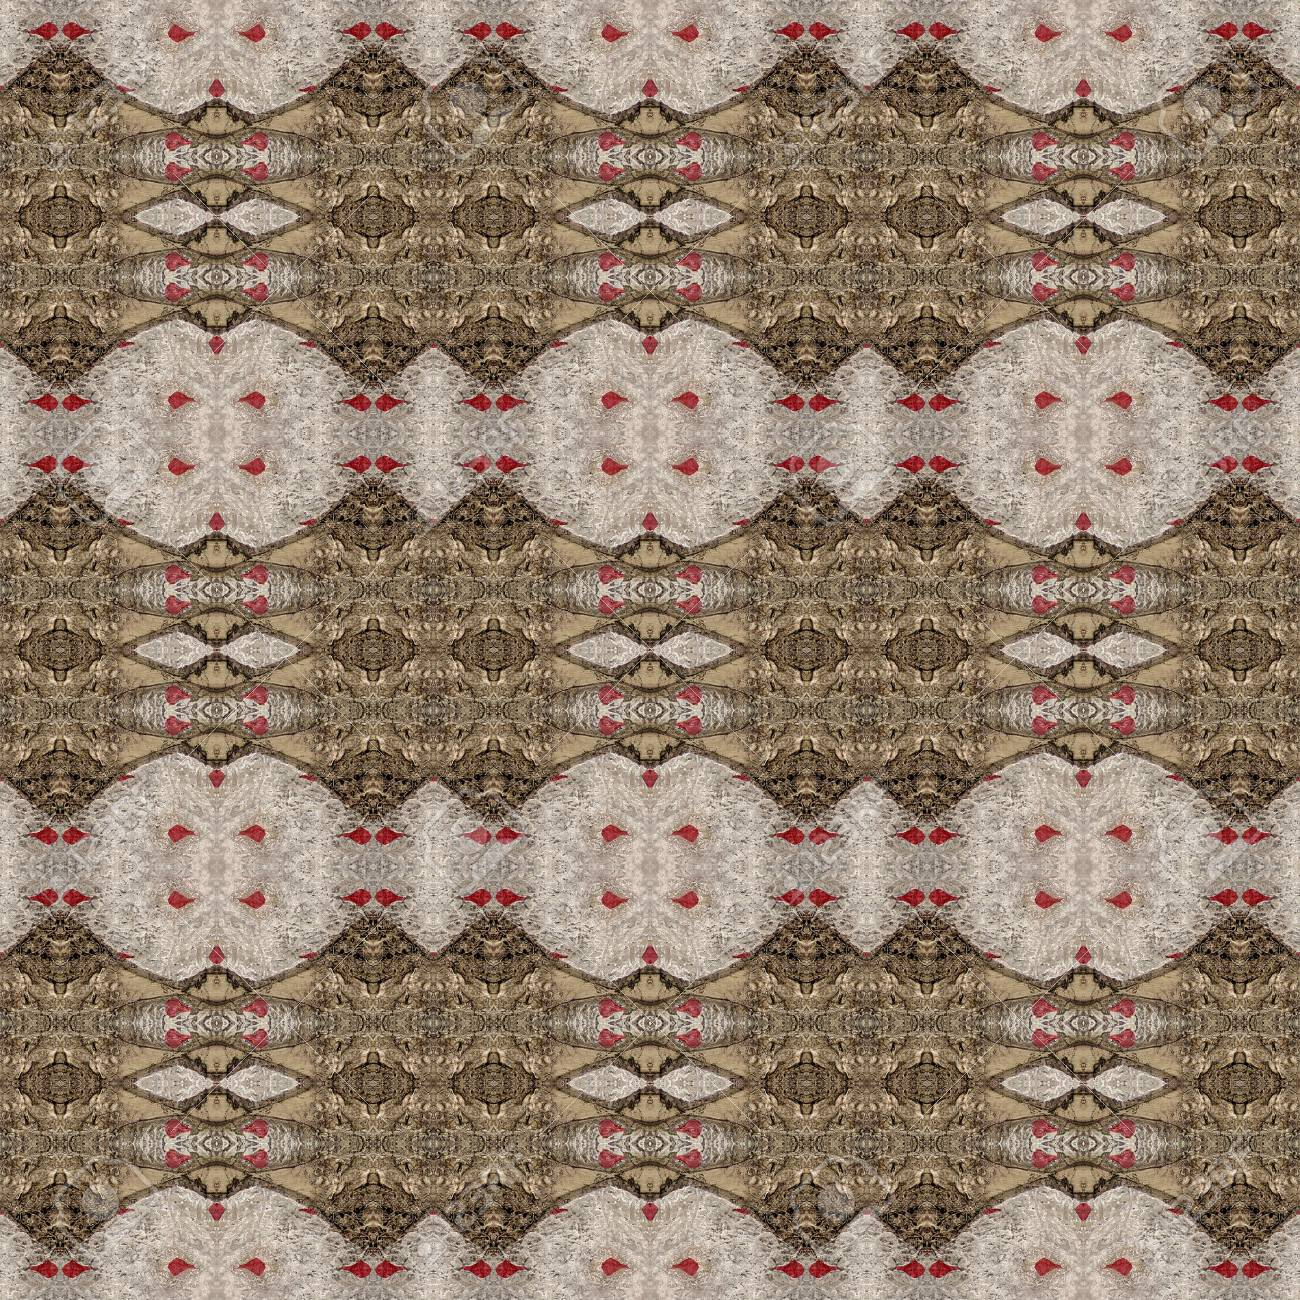 Seamless Design Of Textured Gothic Pattern Wallpaper Background